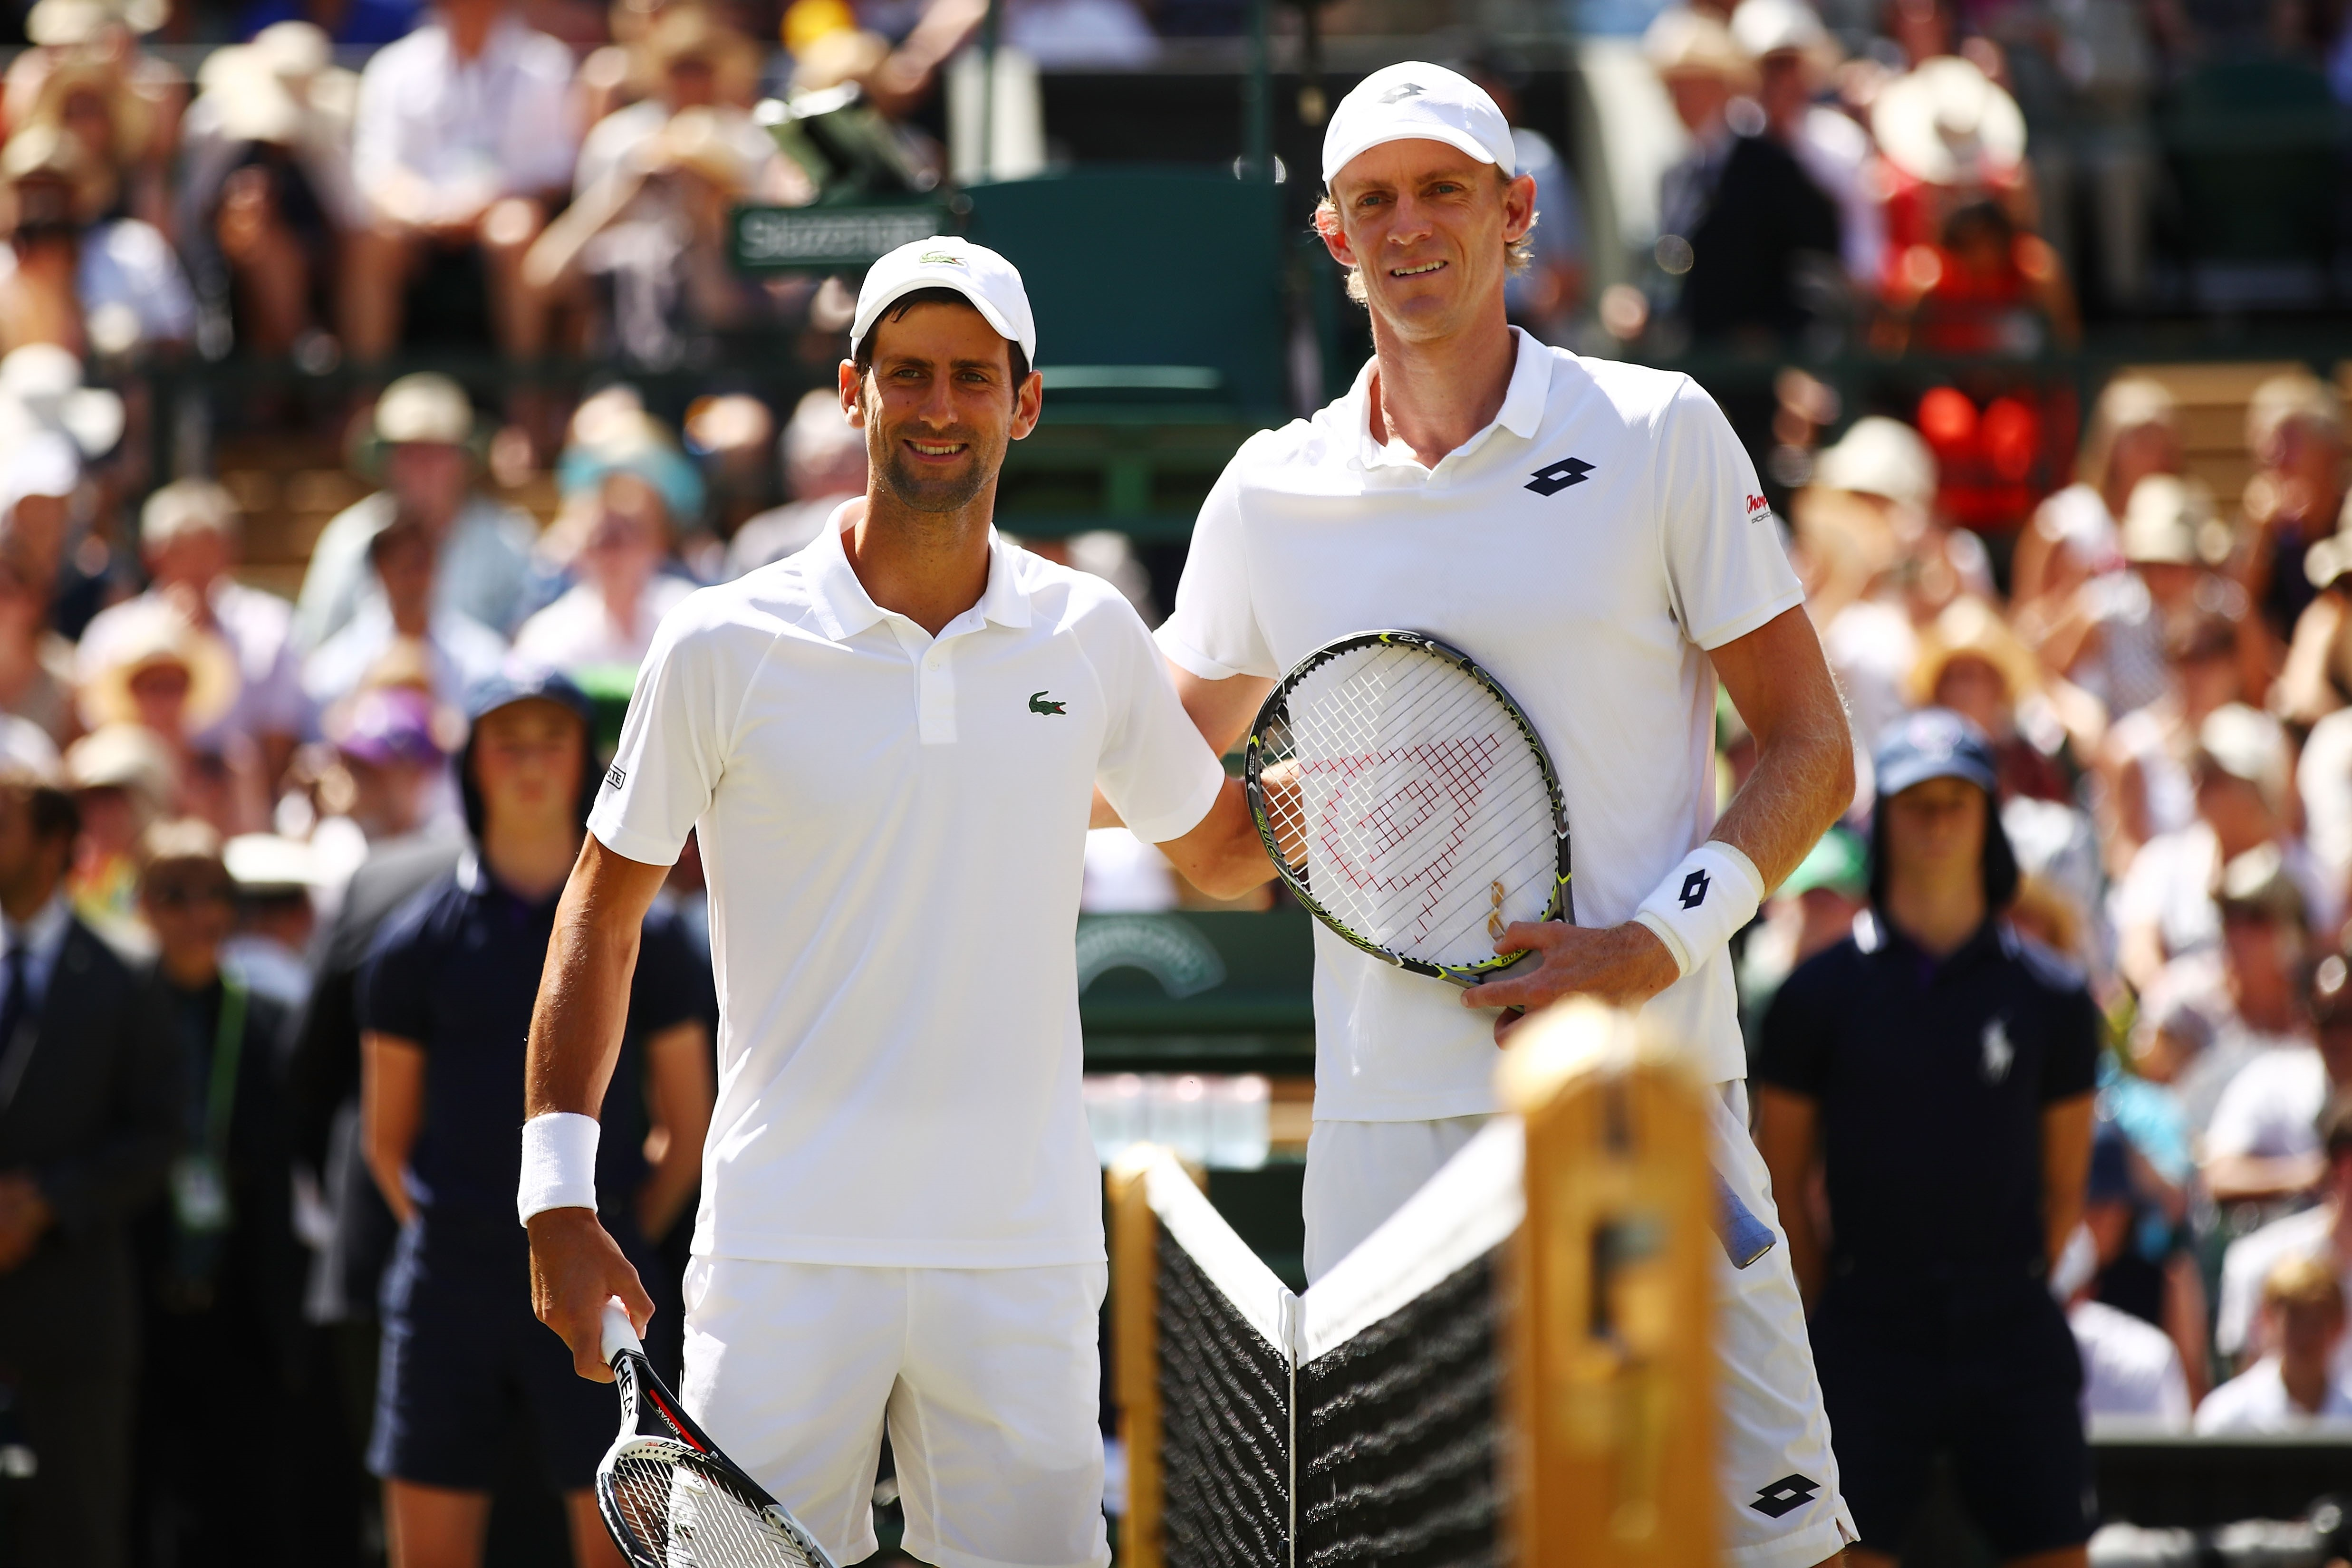 Novak Djokovic et Kevin Anderson à Wimbledon